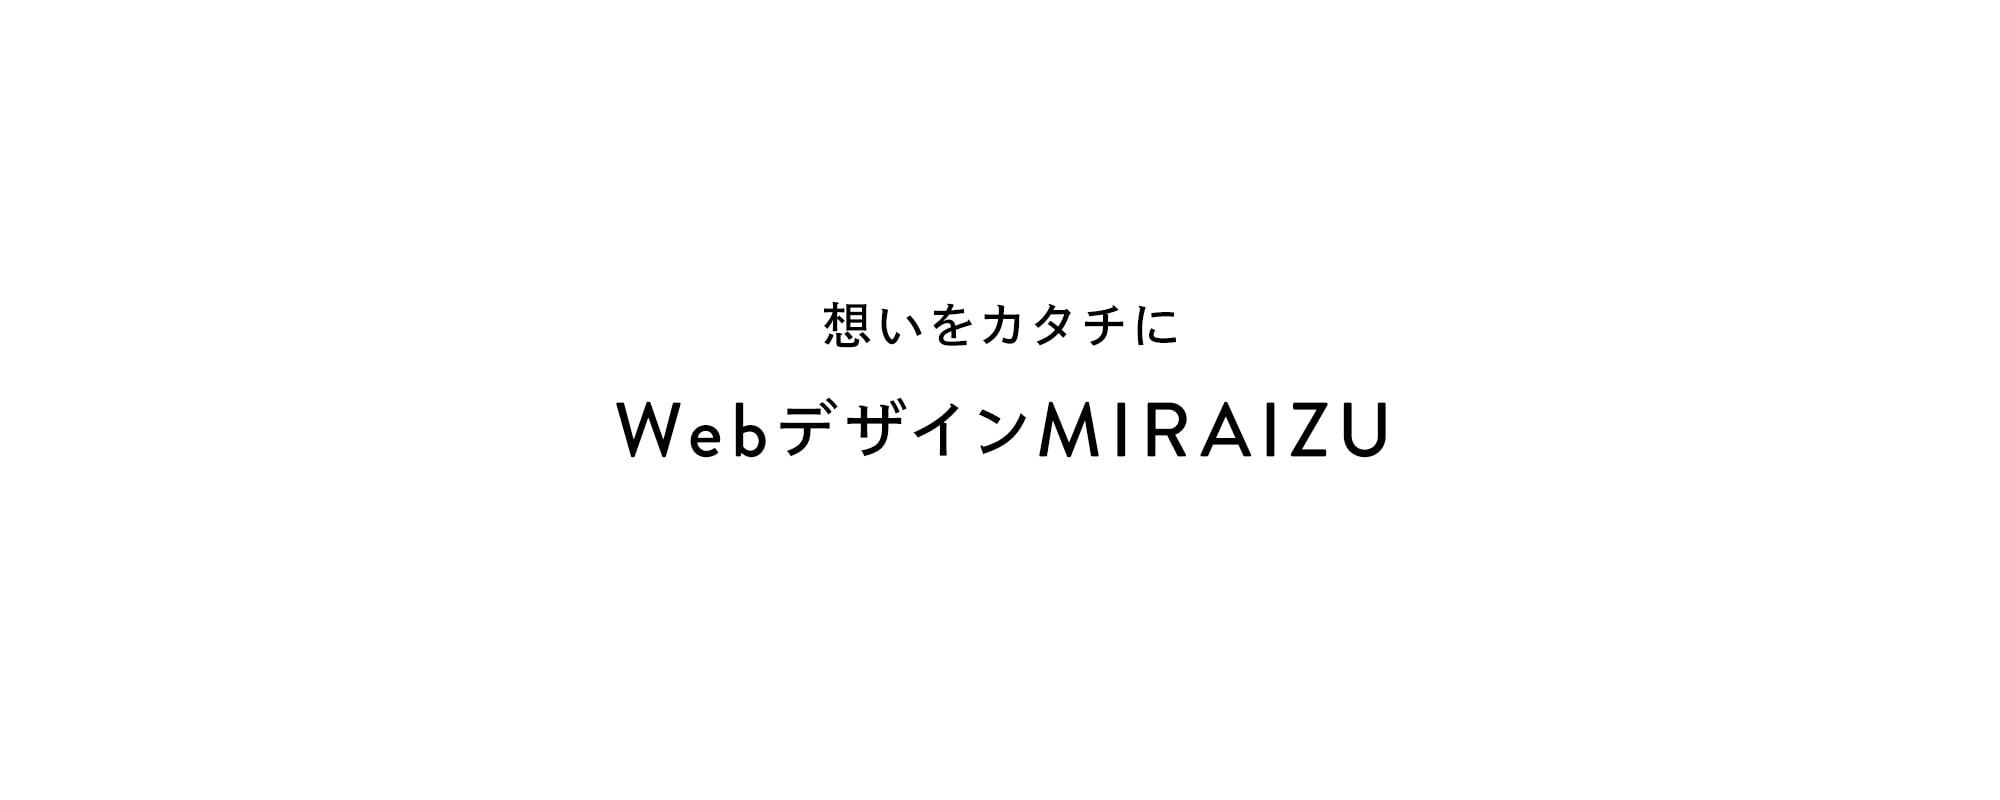 WebデザインMIRAIZU/ミライズ